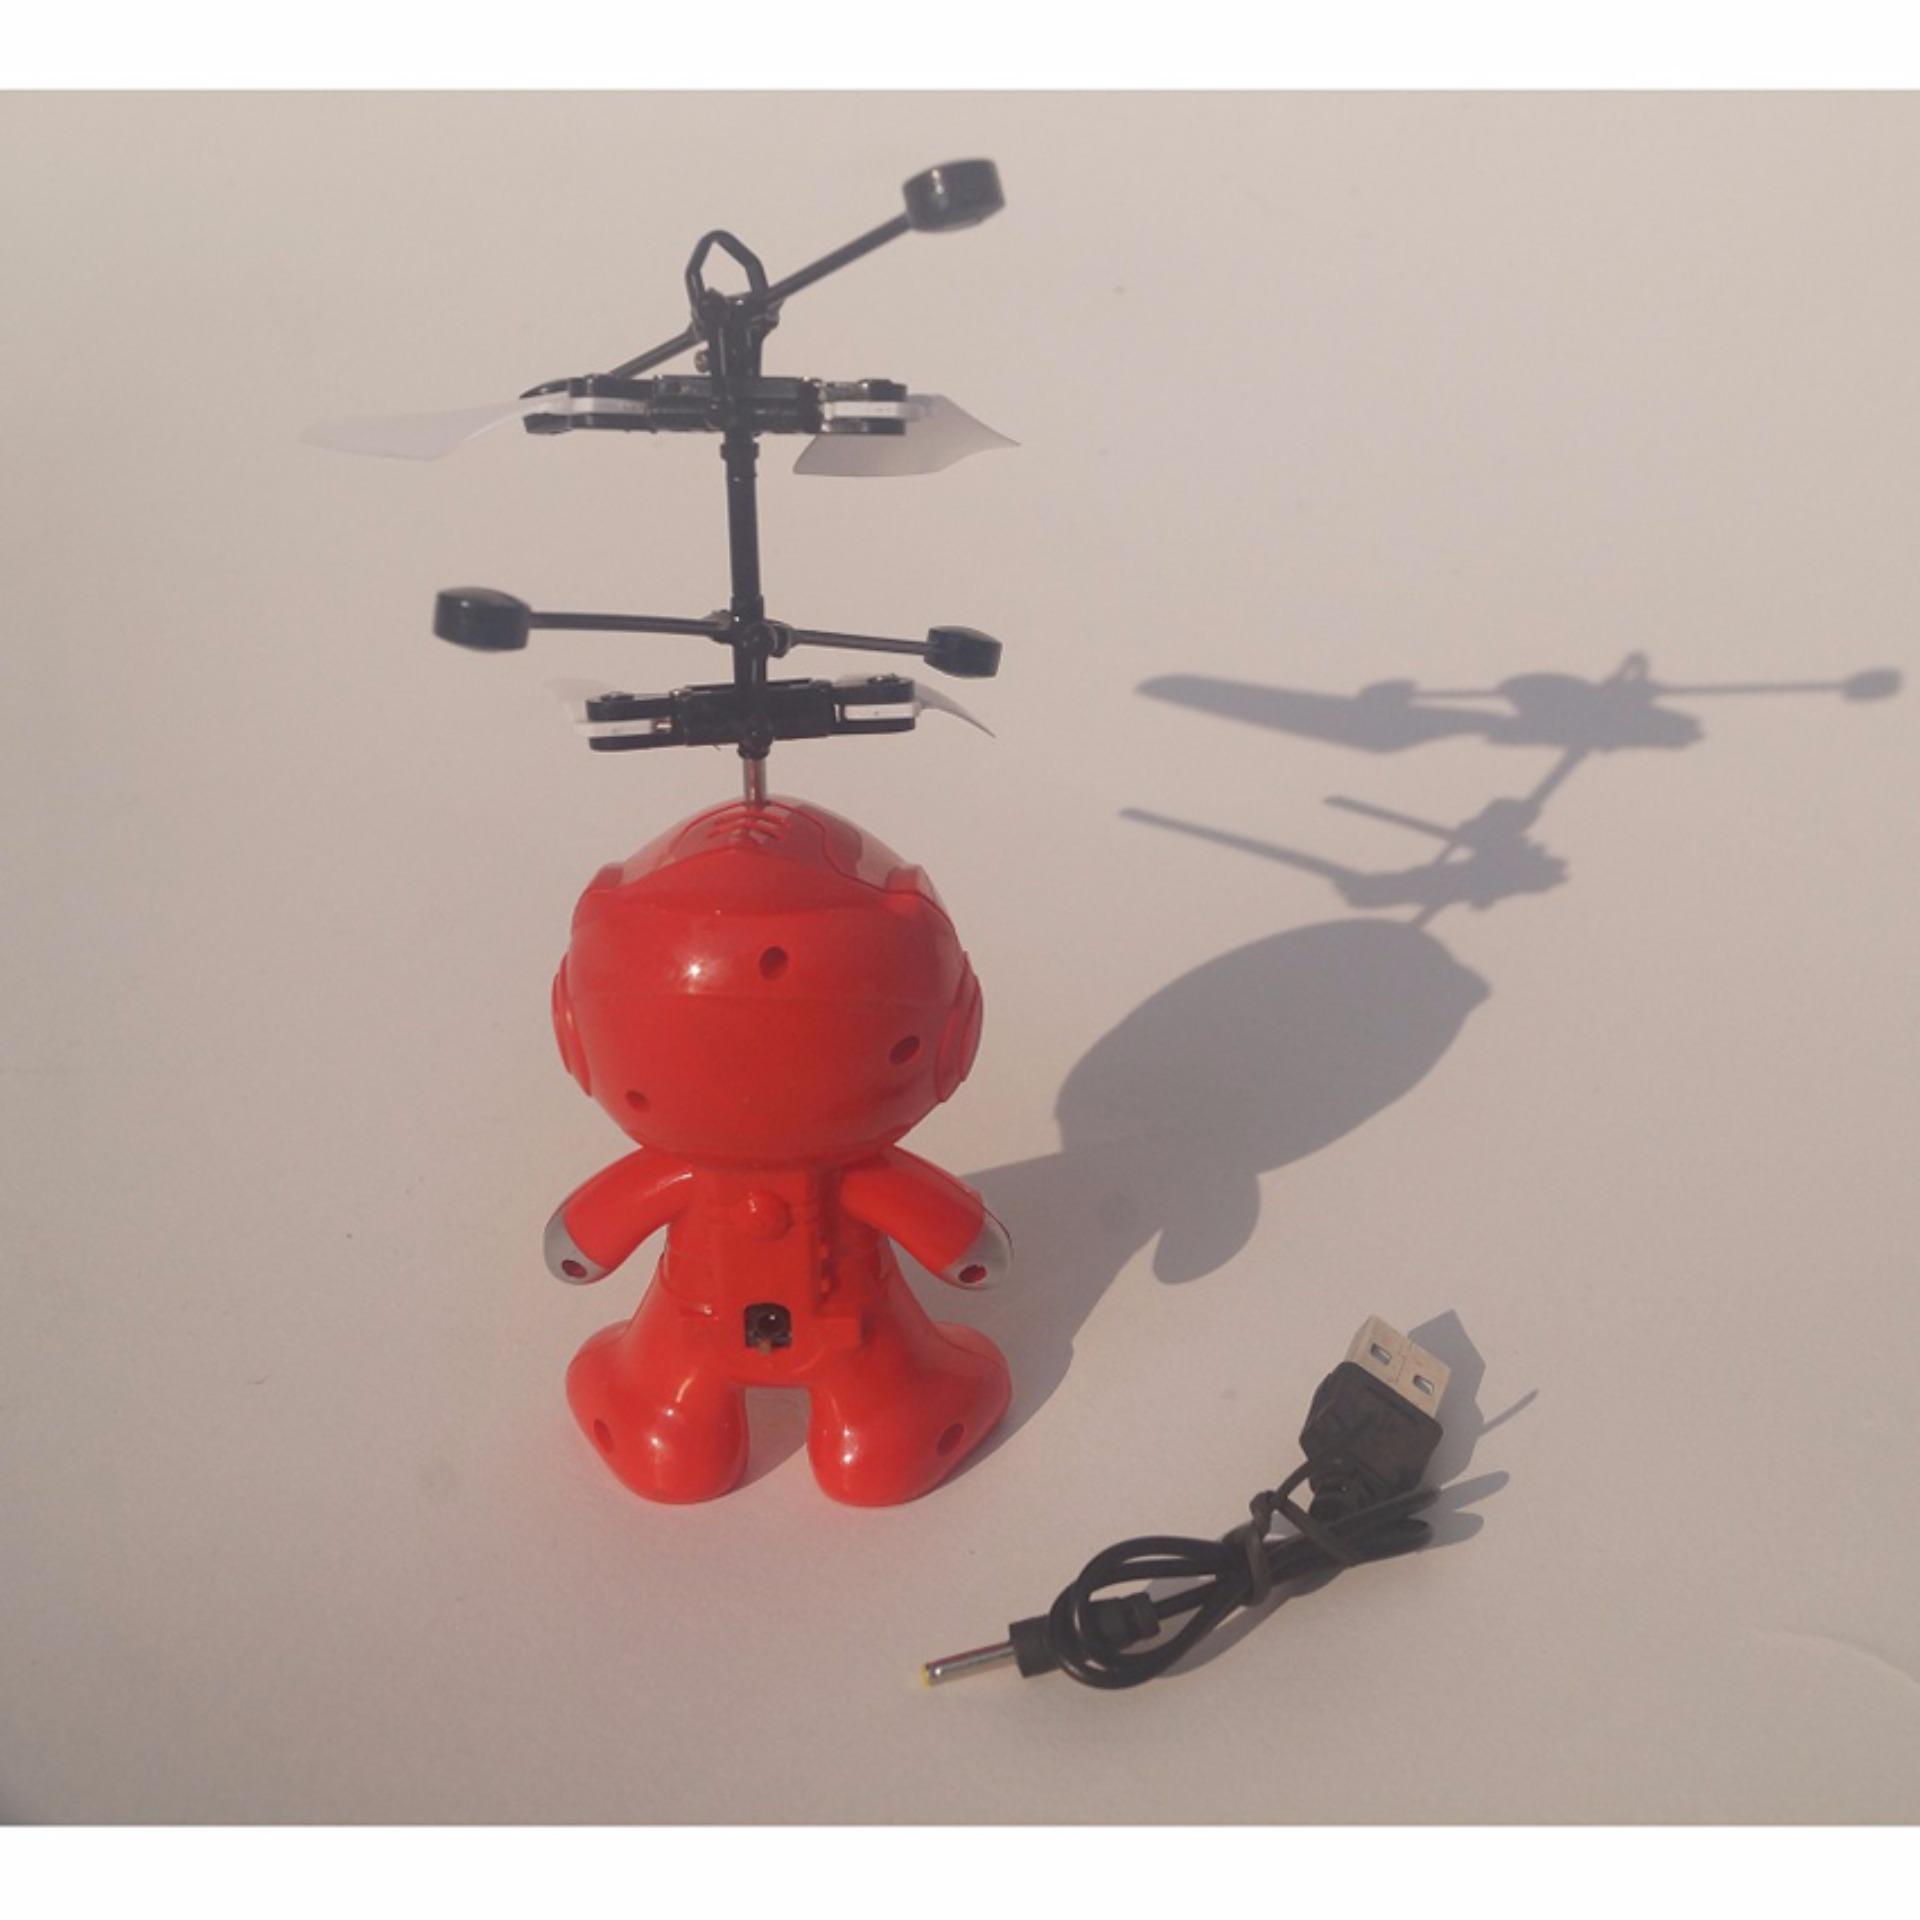 Tope Mainan Helikopter Spiderman Drone Flying Toys - Merah ...